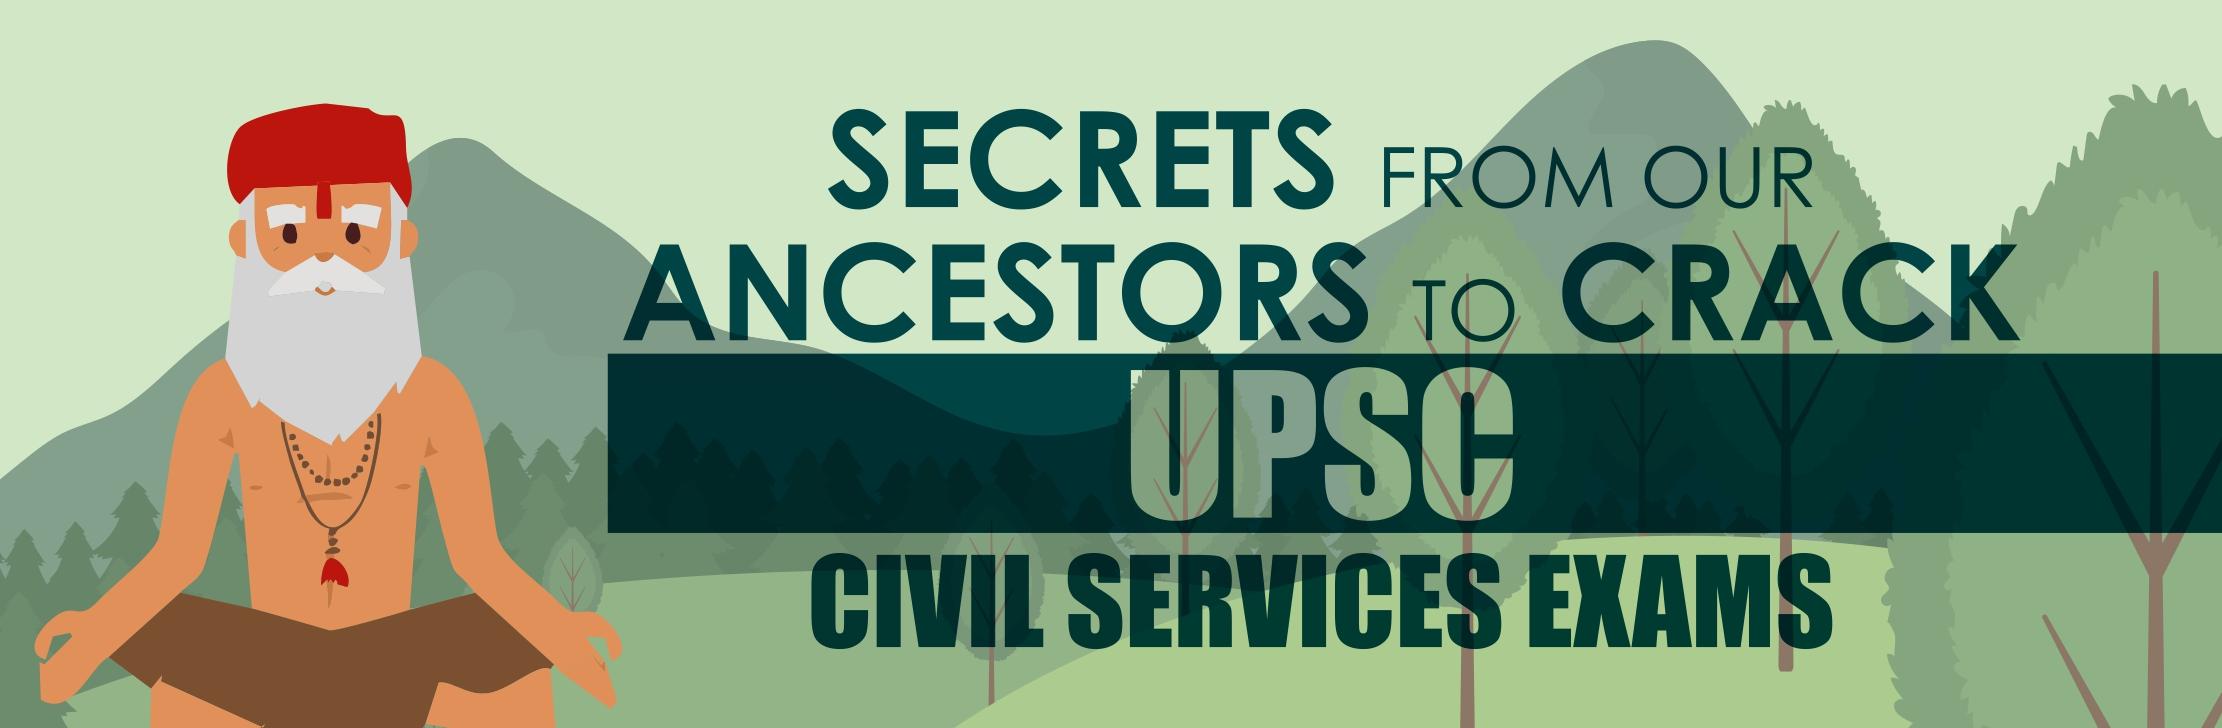 Secrets from our ancestors to crack UPSC civil services exams